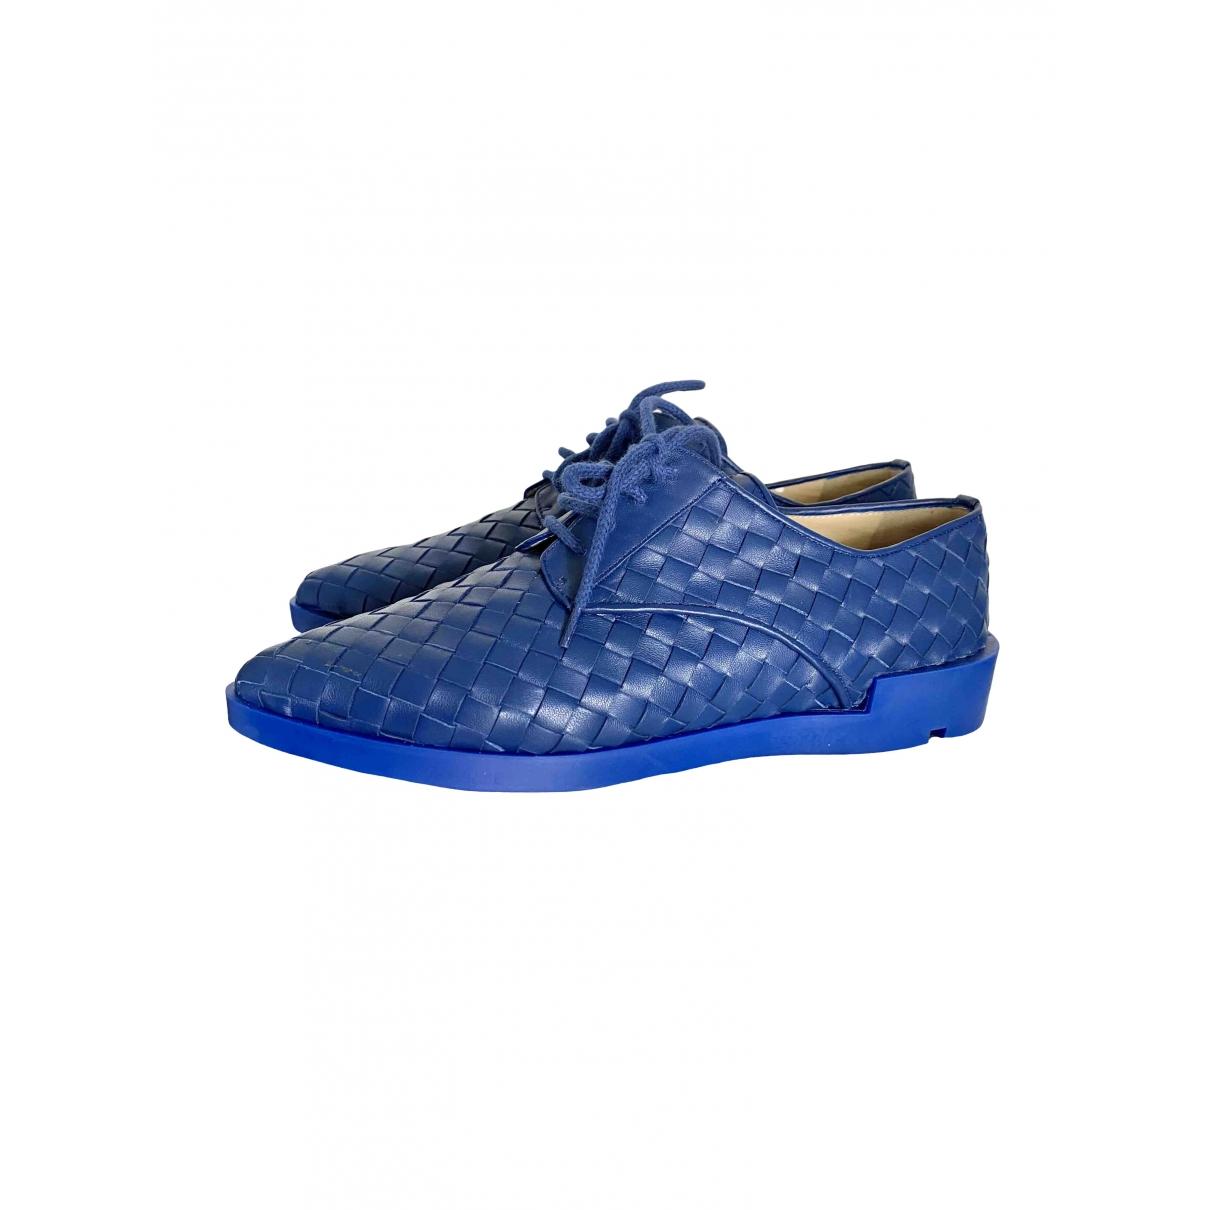 Baldinini \N Blue Leather Flats for Women 38.5 EU